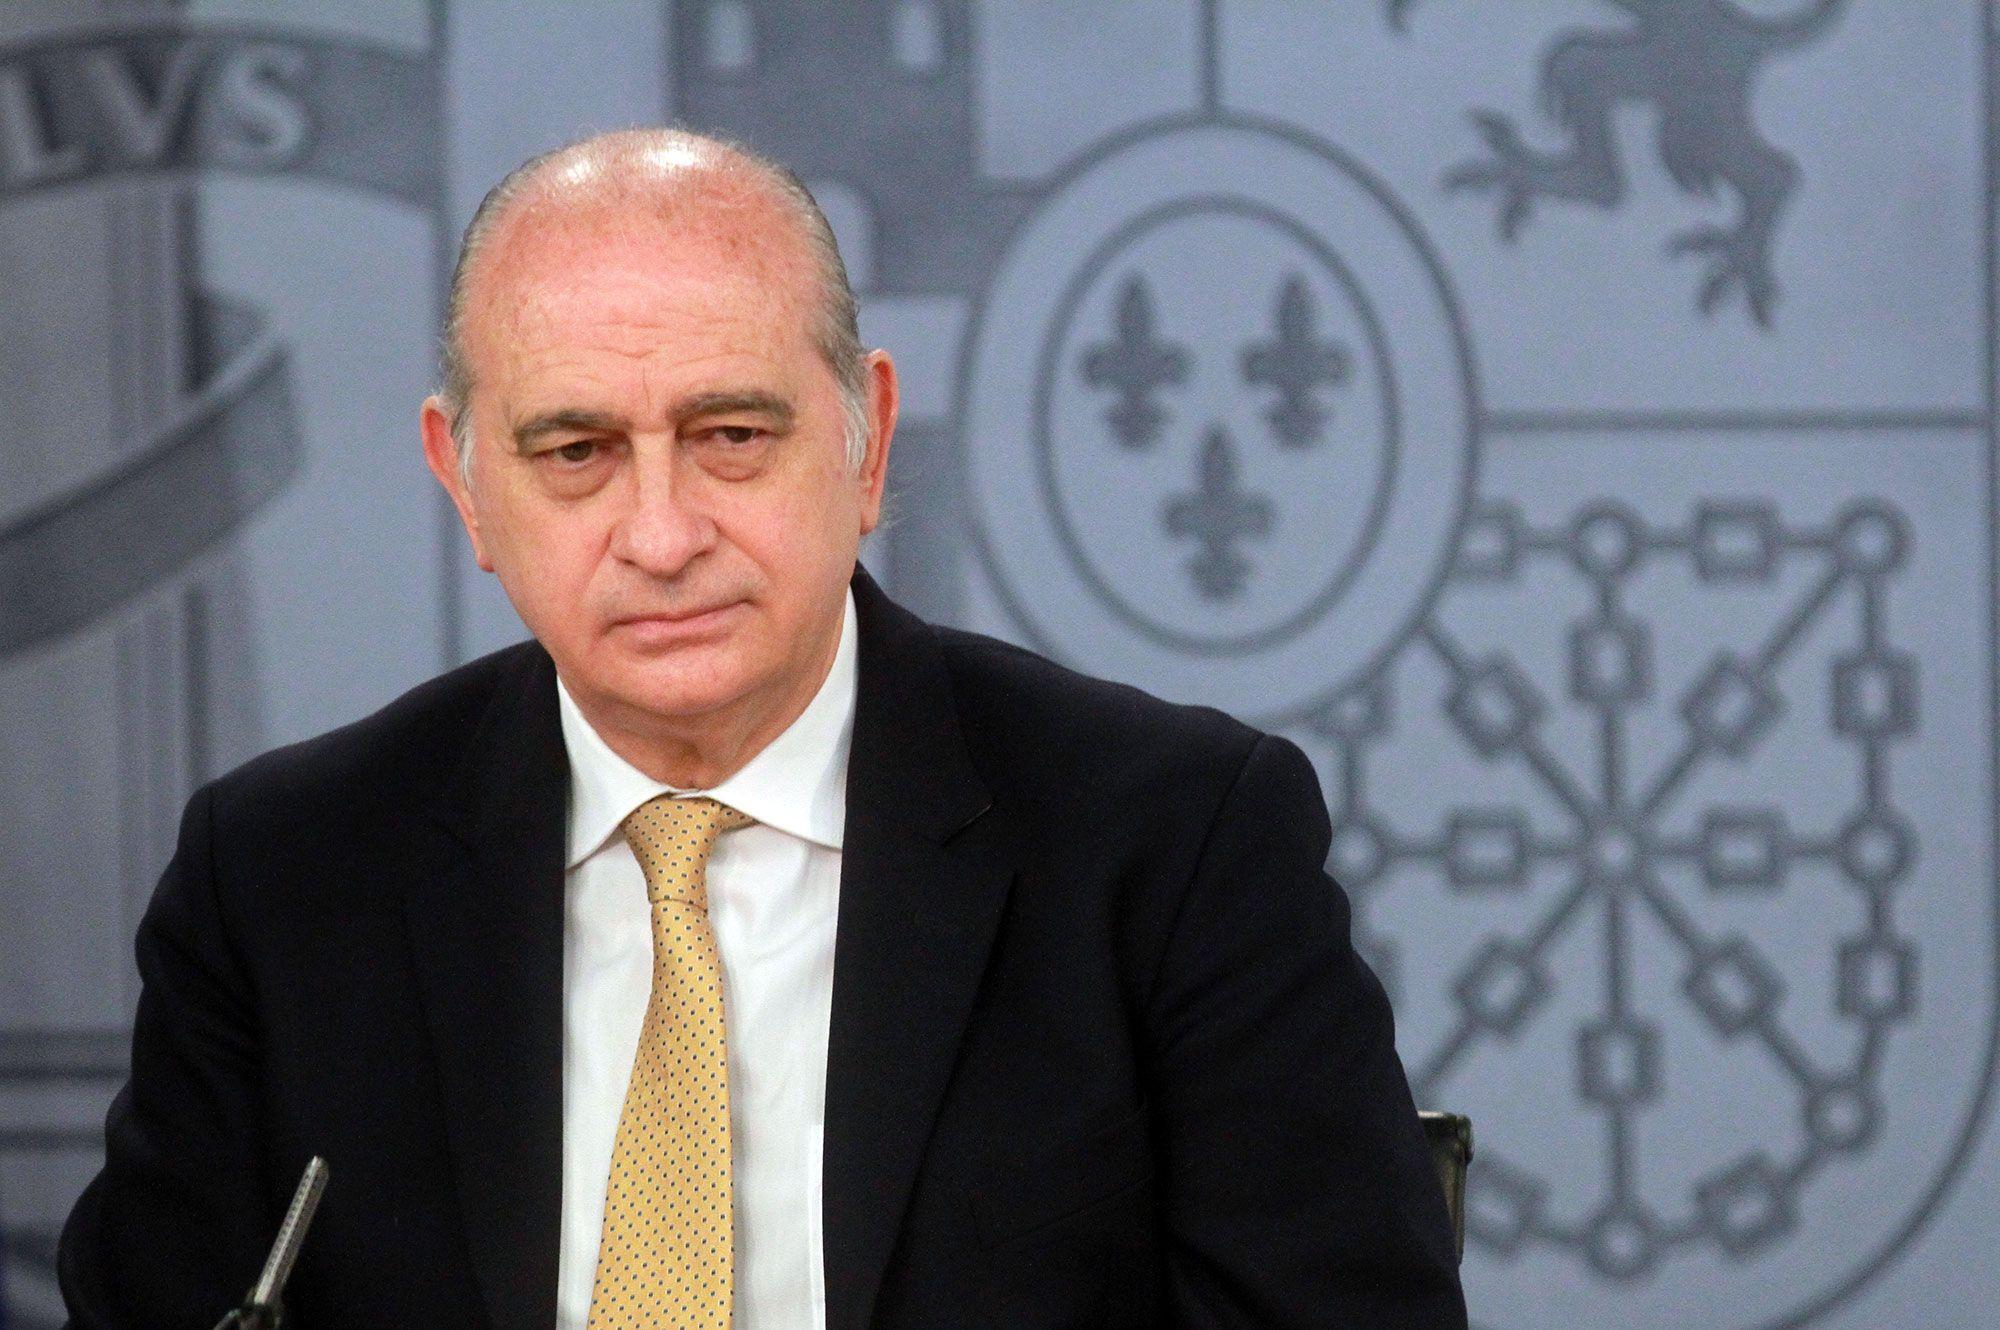 Real casino murcia el ministro del interior abre el for Ministro del interior actual